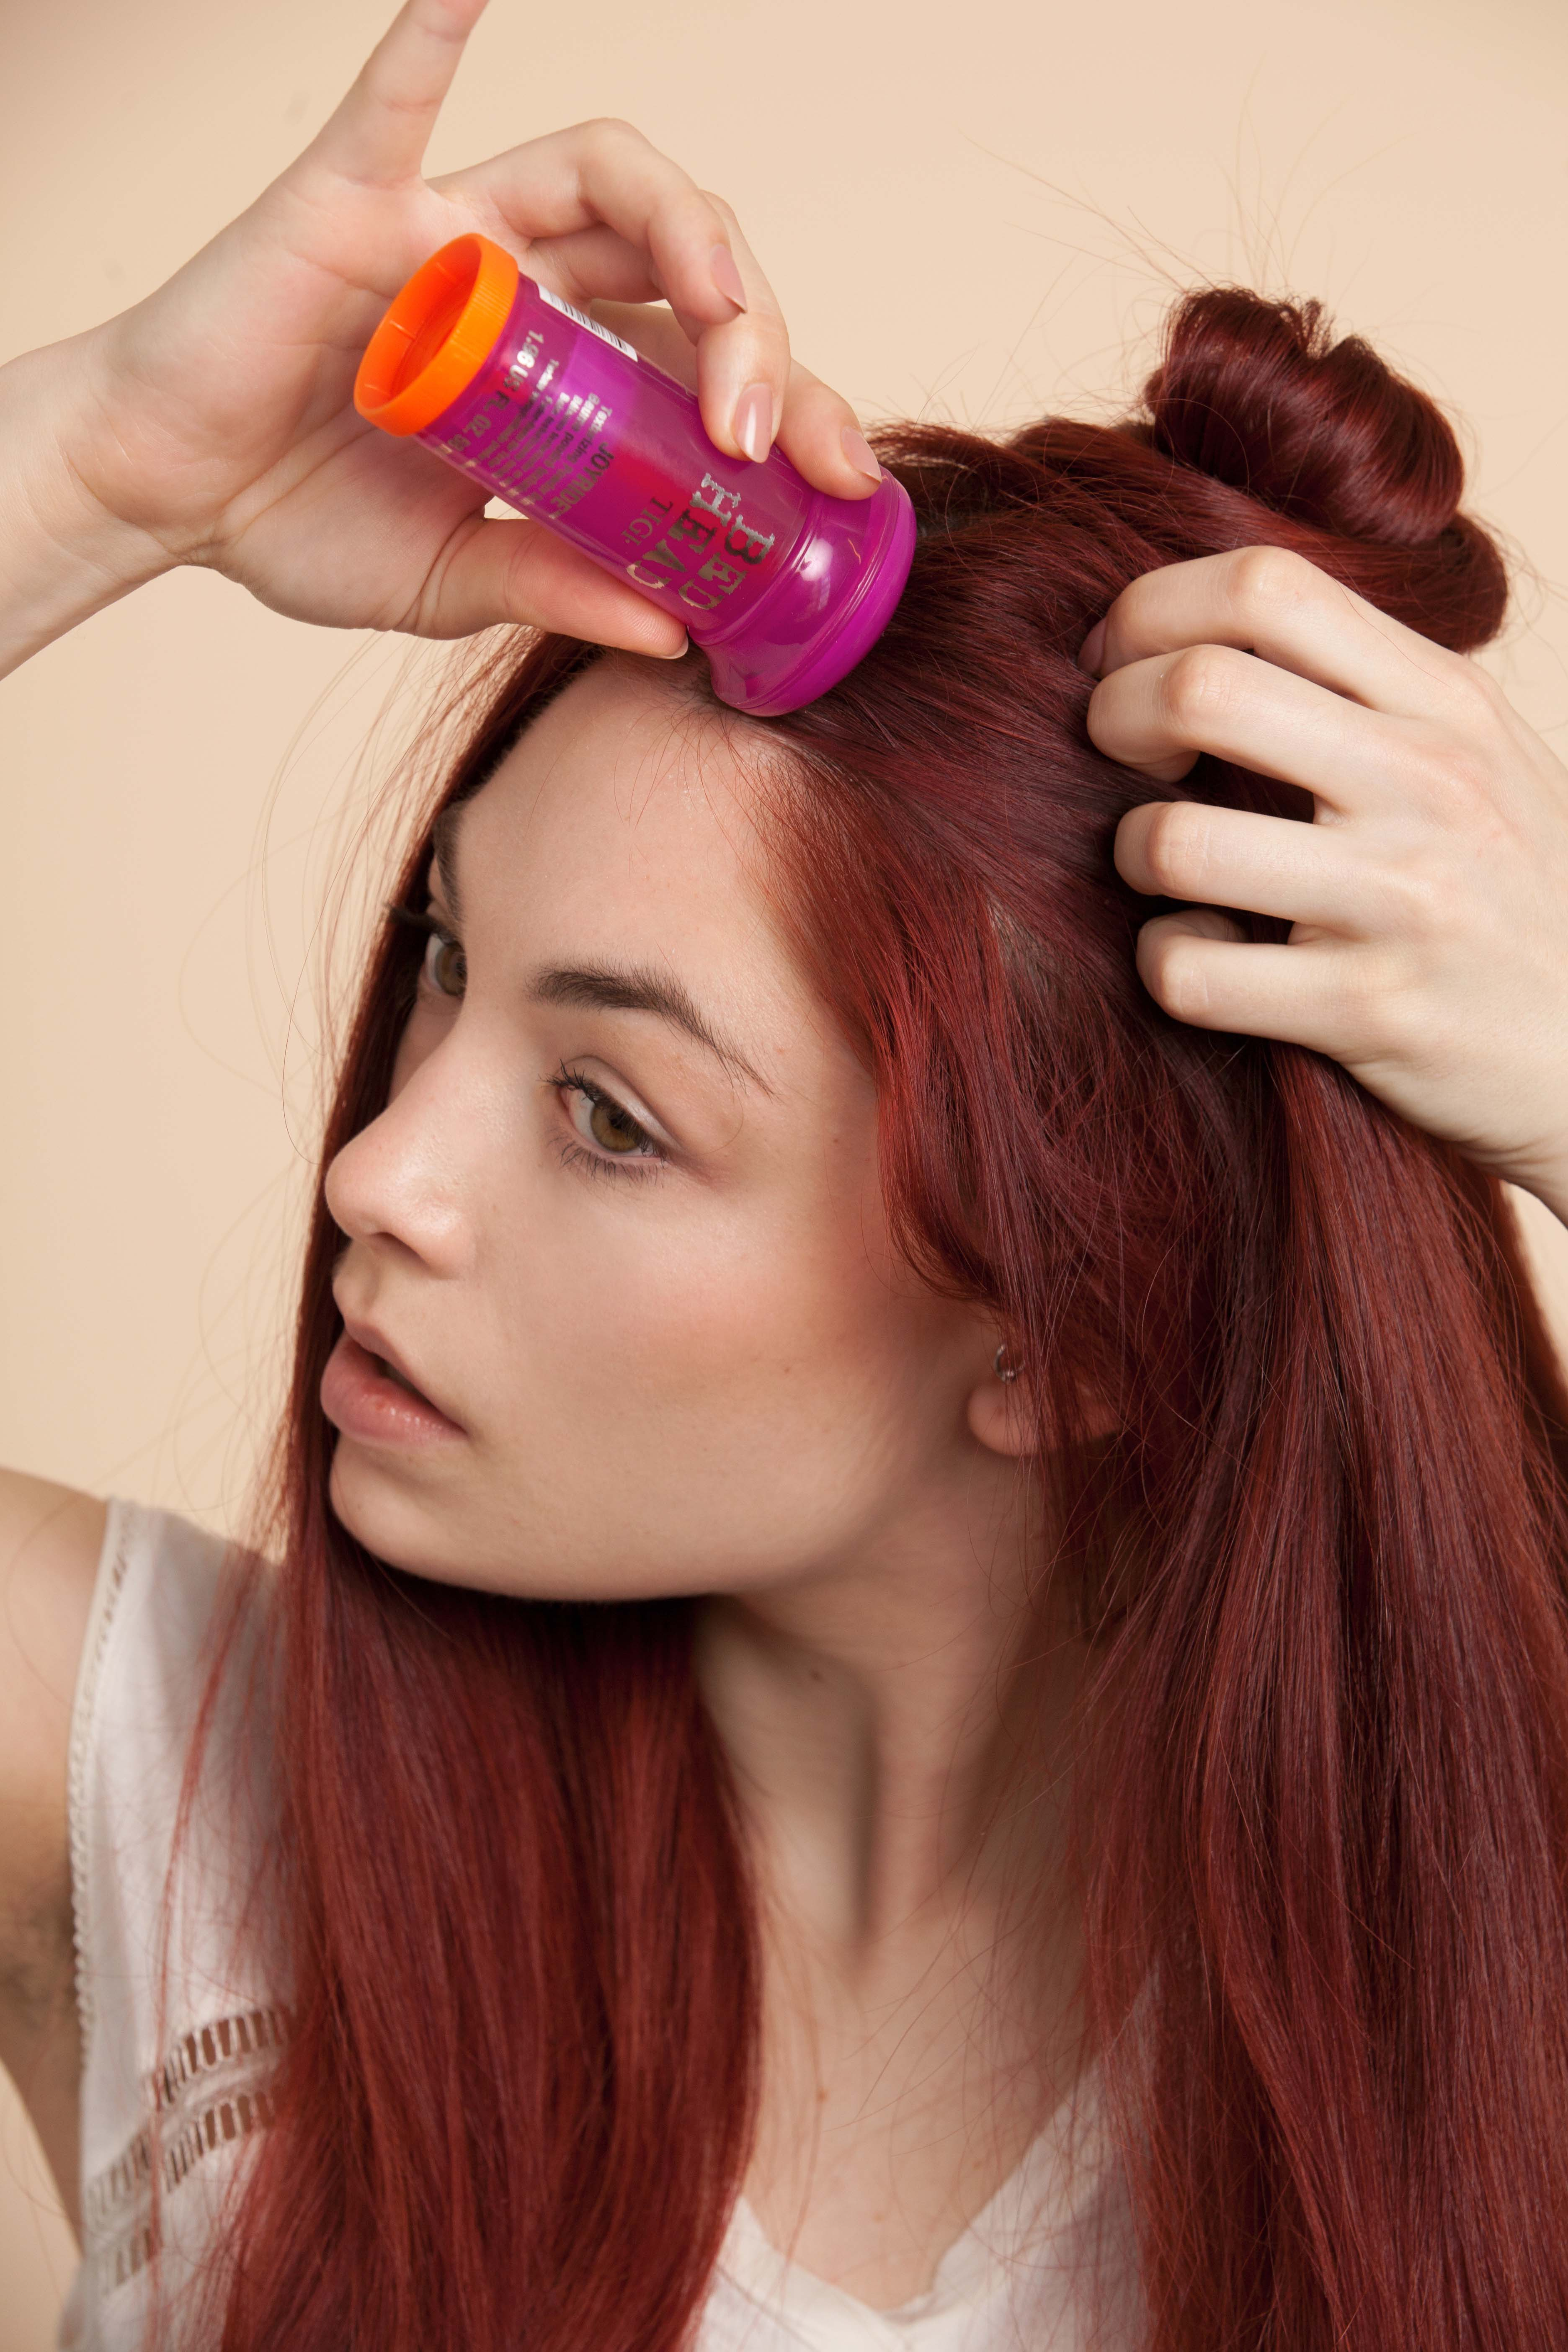 hair powder for styling women's hair